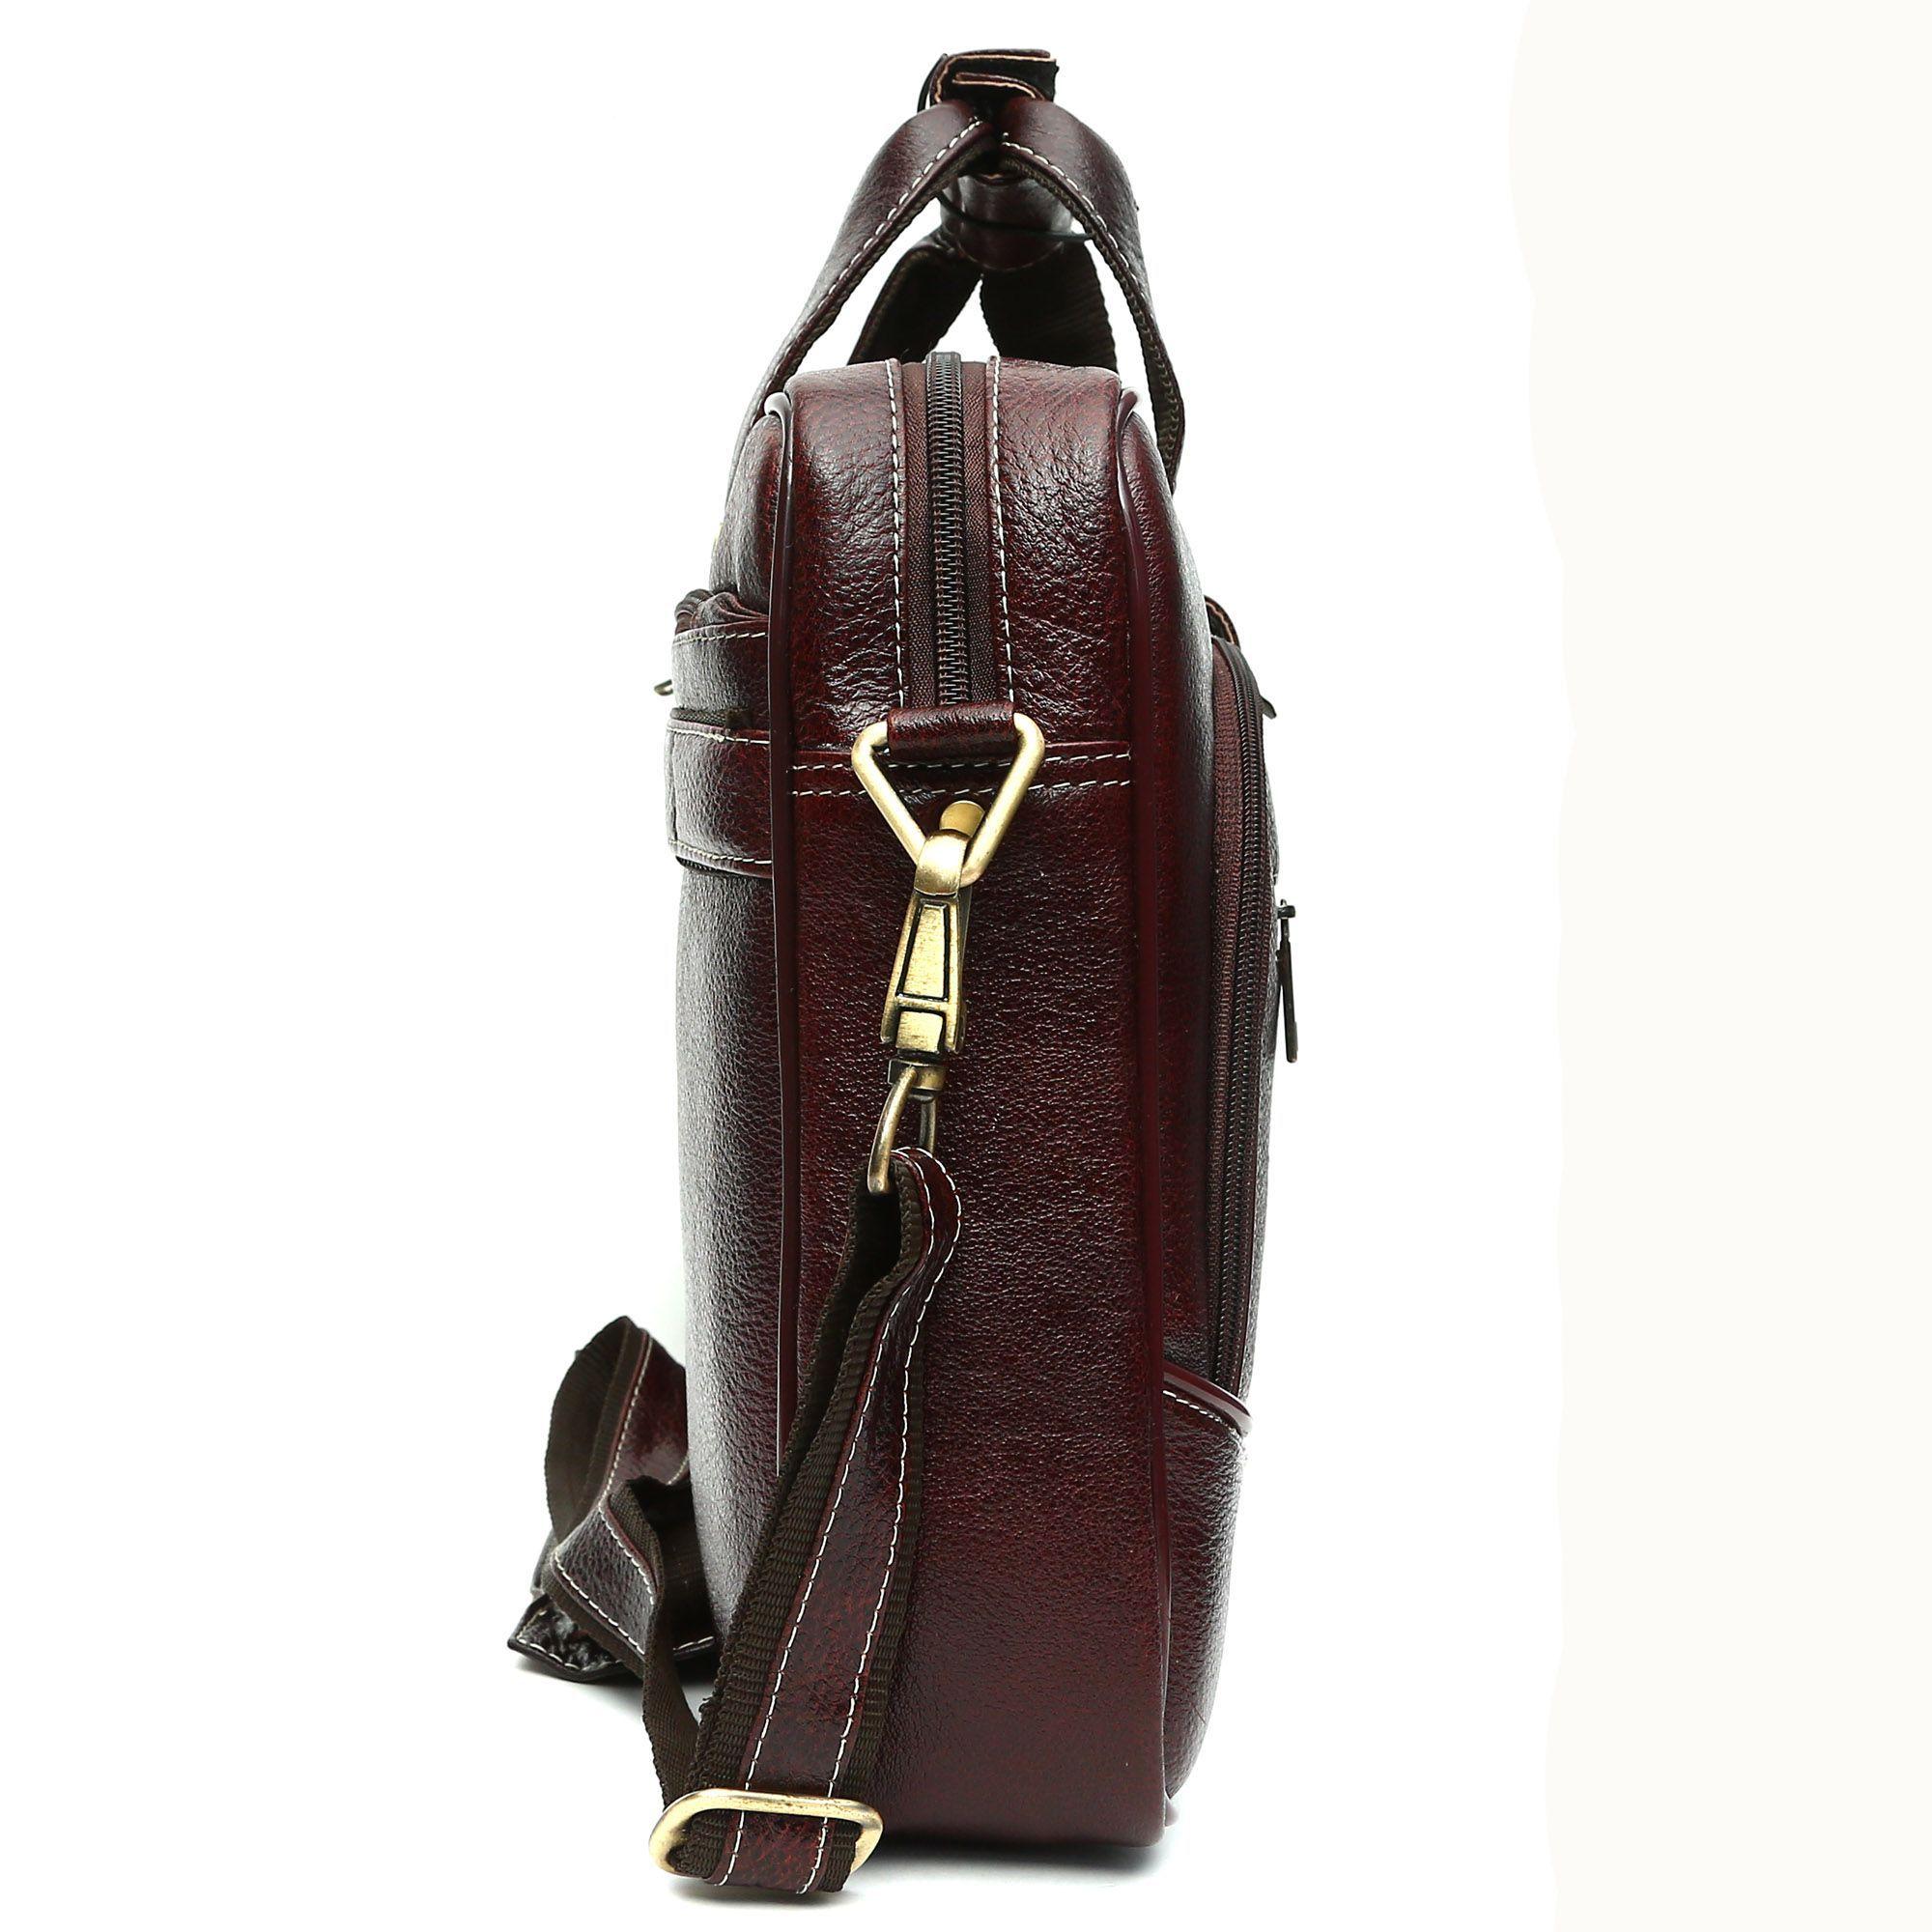 HAMMONDS FLYCATCHER Brown Leather Office Bag - Buy HAMMONDS ... e2beb7d93330b